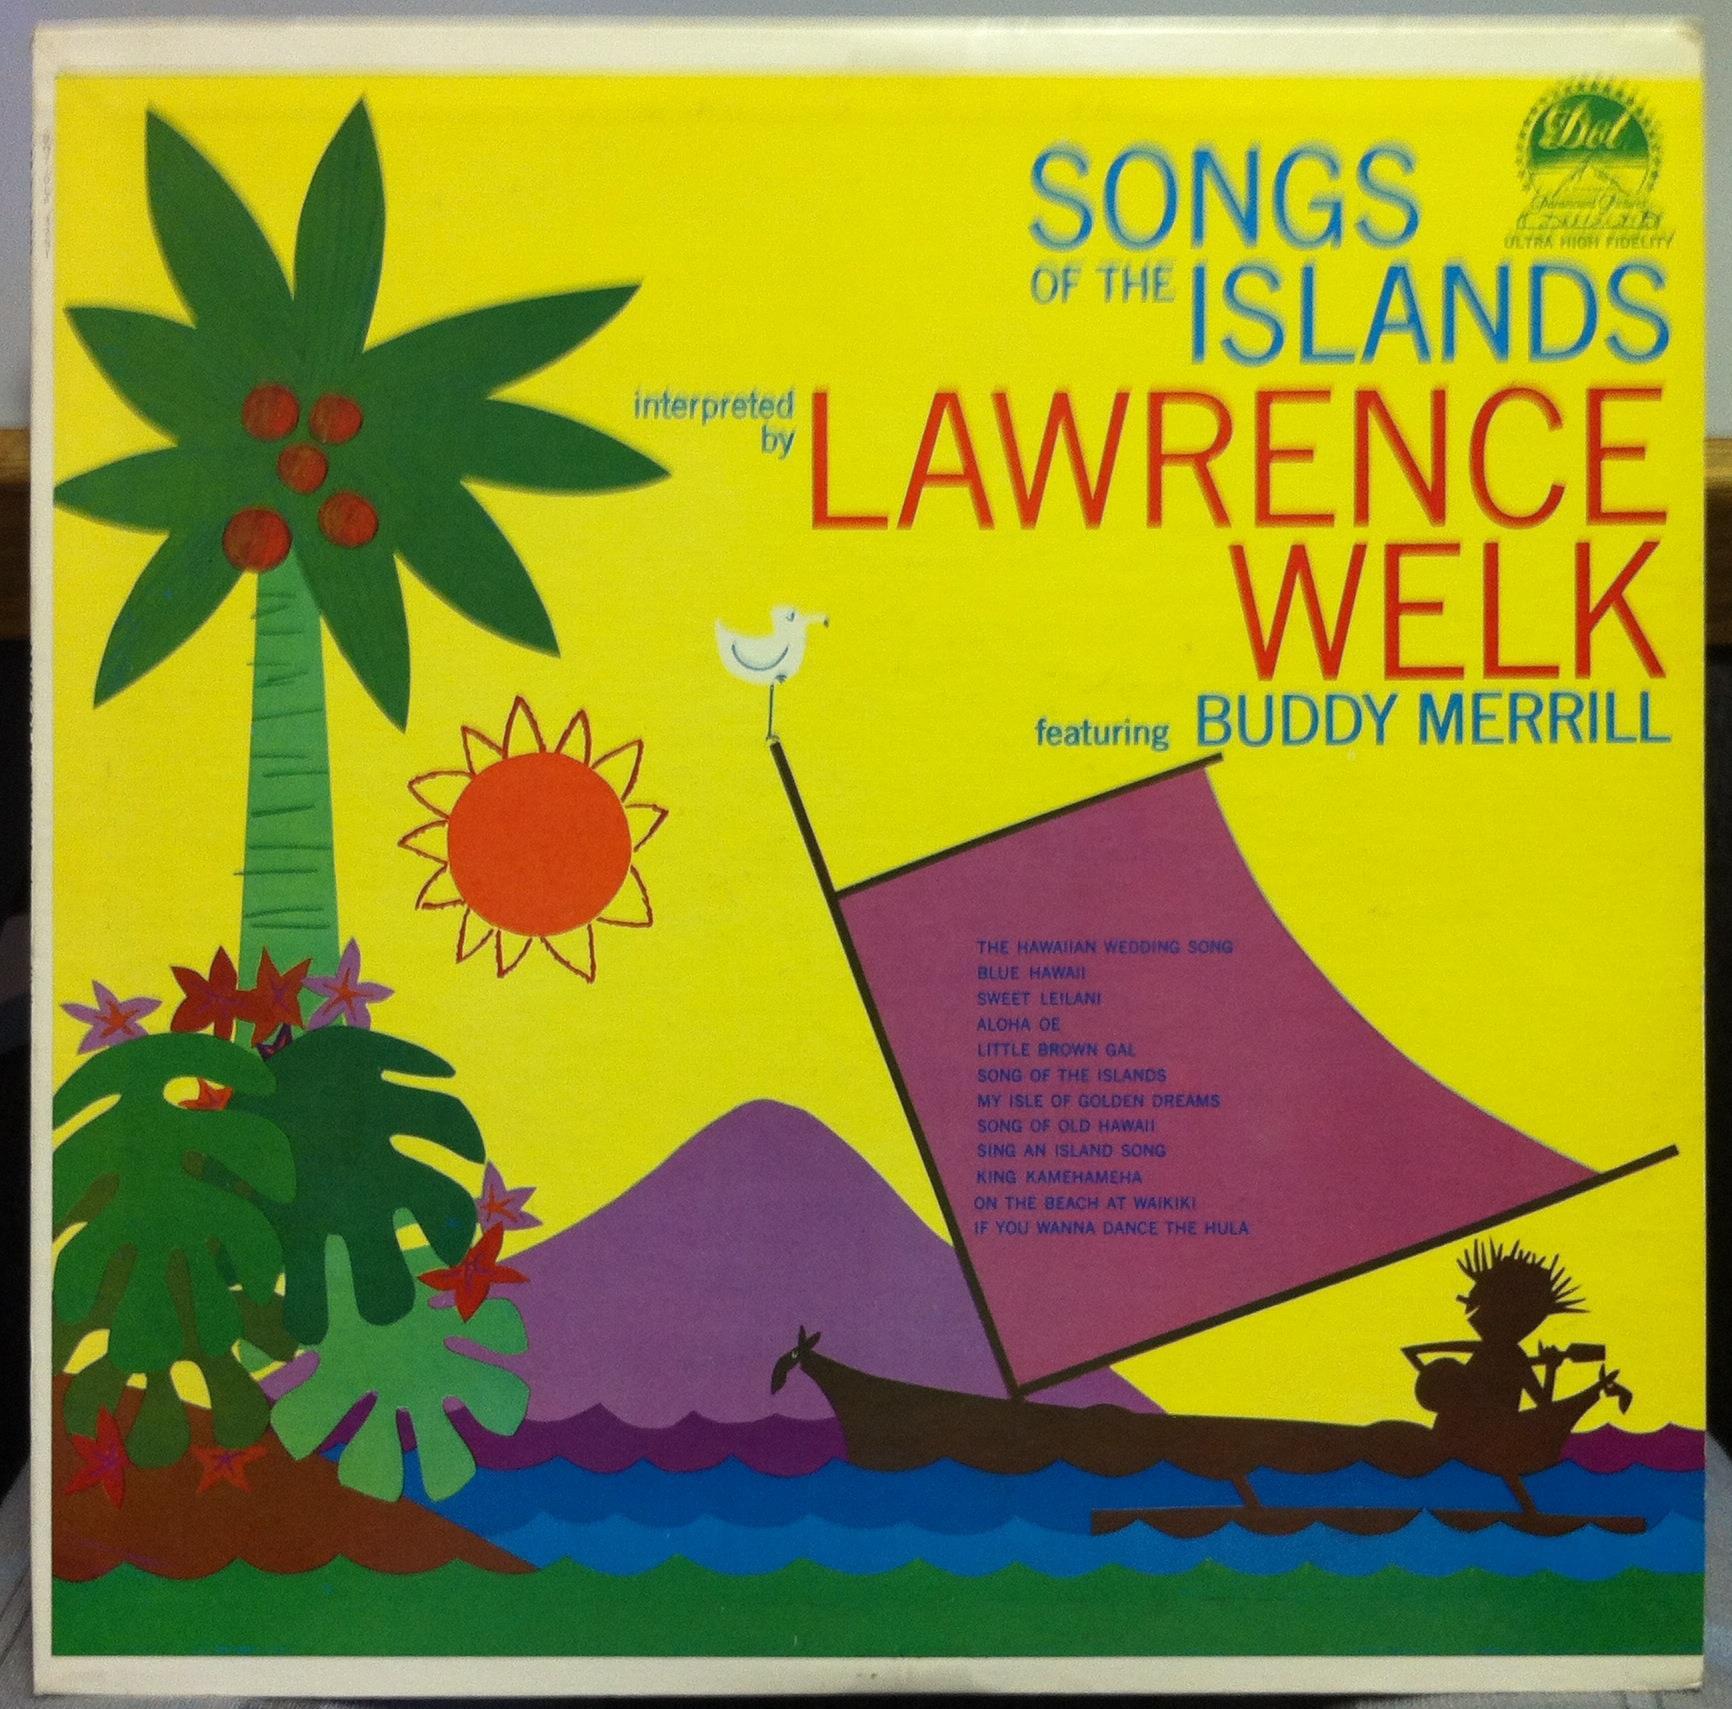 LAWRENCE WELK - Lawrence Welk Songfs Of The Islands Lp Mint- Dlp 3251 Vinyl 1960 1st Press (songfs Of The Islands)